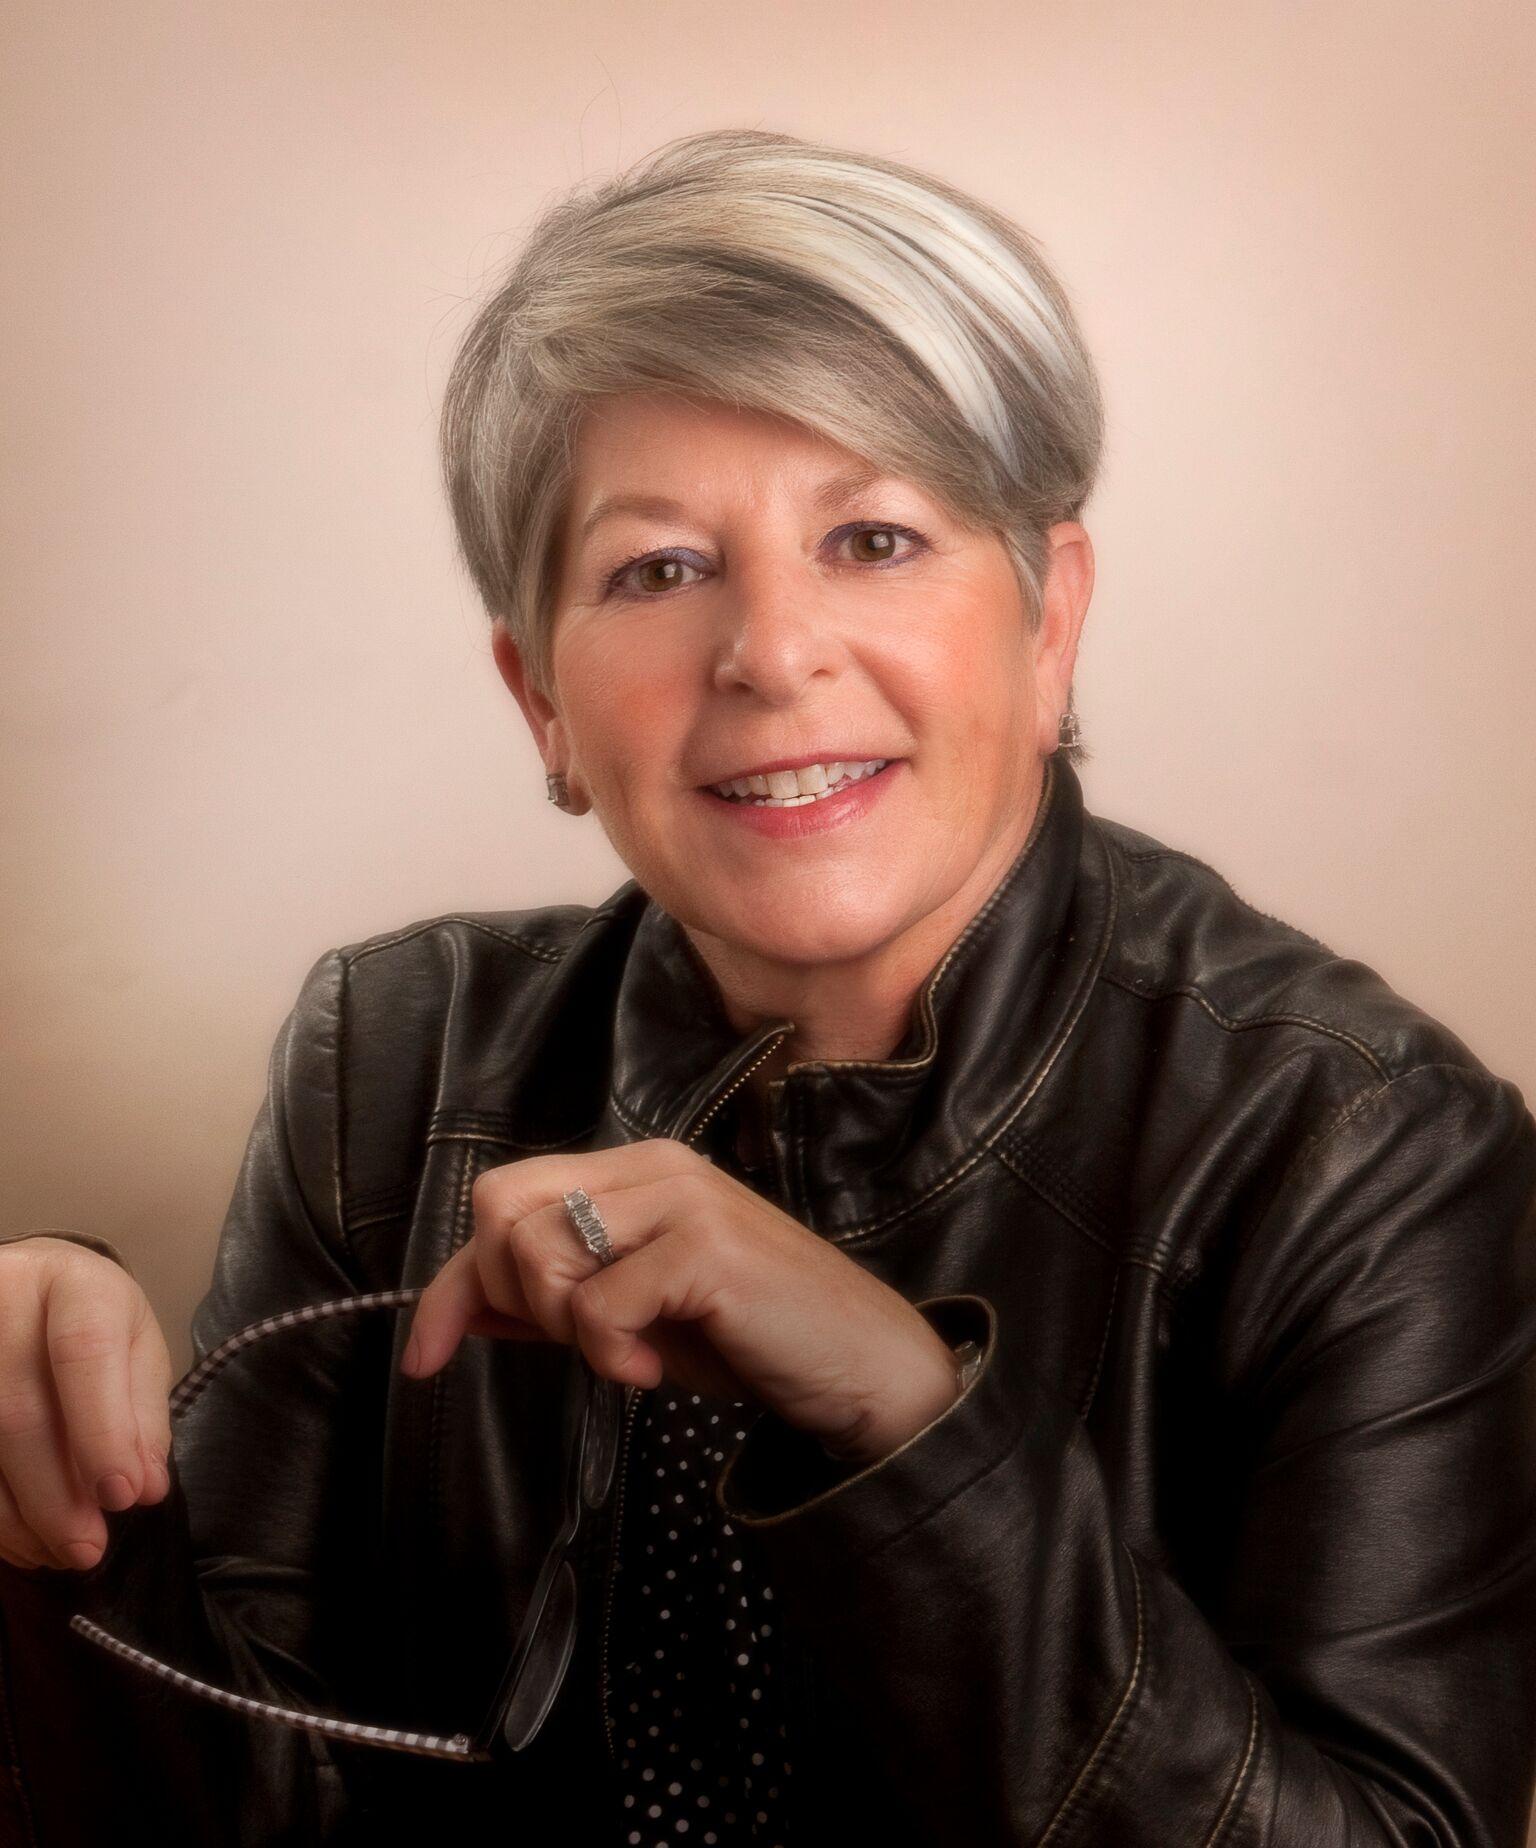 Patti Biro Headshot